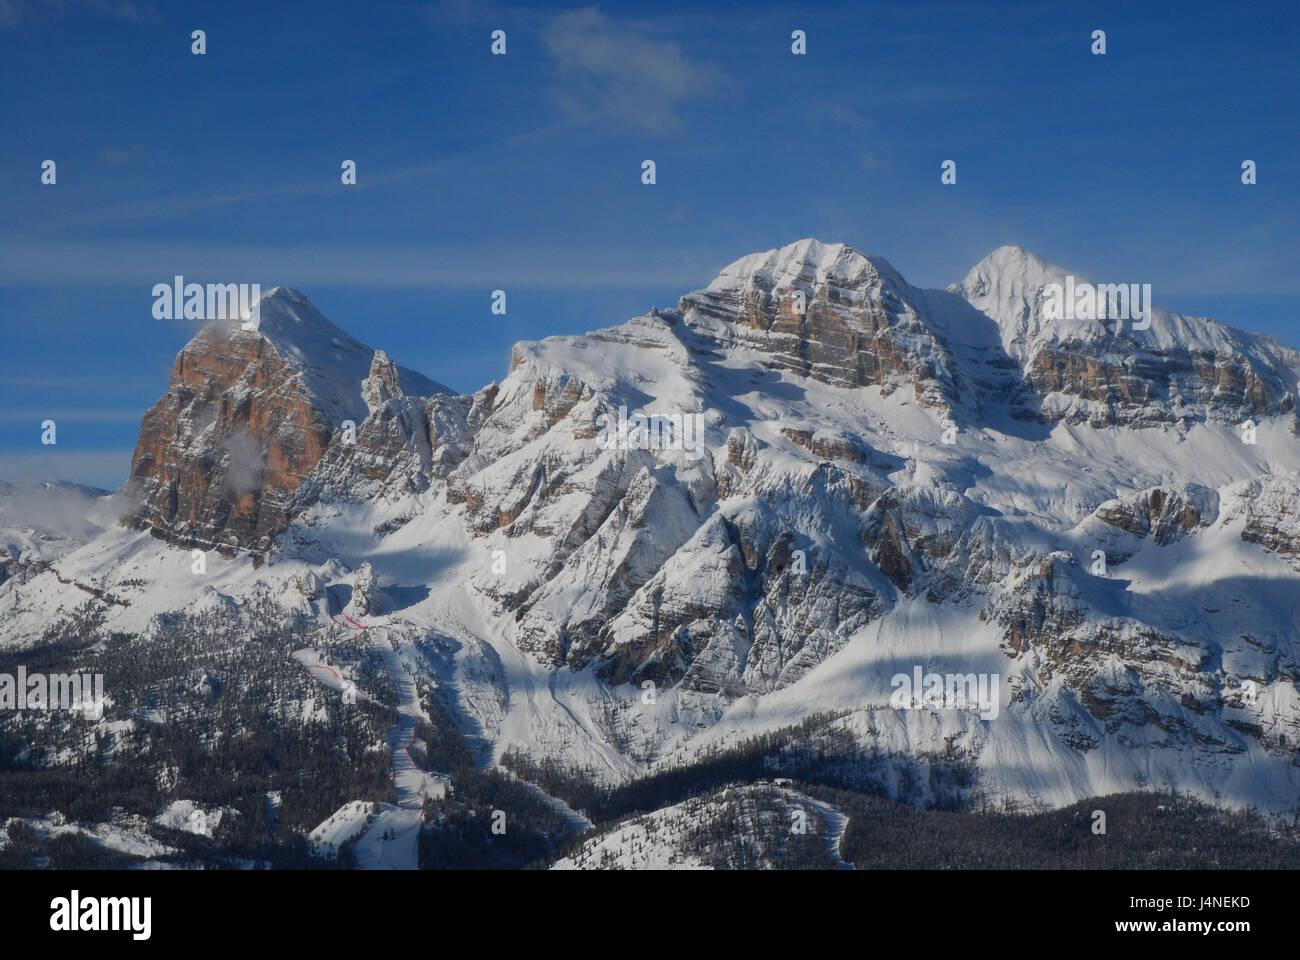 L'Italia, Veneto, Cortina d'Ampezzo, Tofana Tu Rozes, Tofana Tu mezzosoprano, Tofana Tu dentro, inverno, Immagini Stock